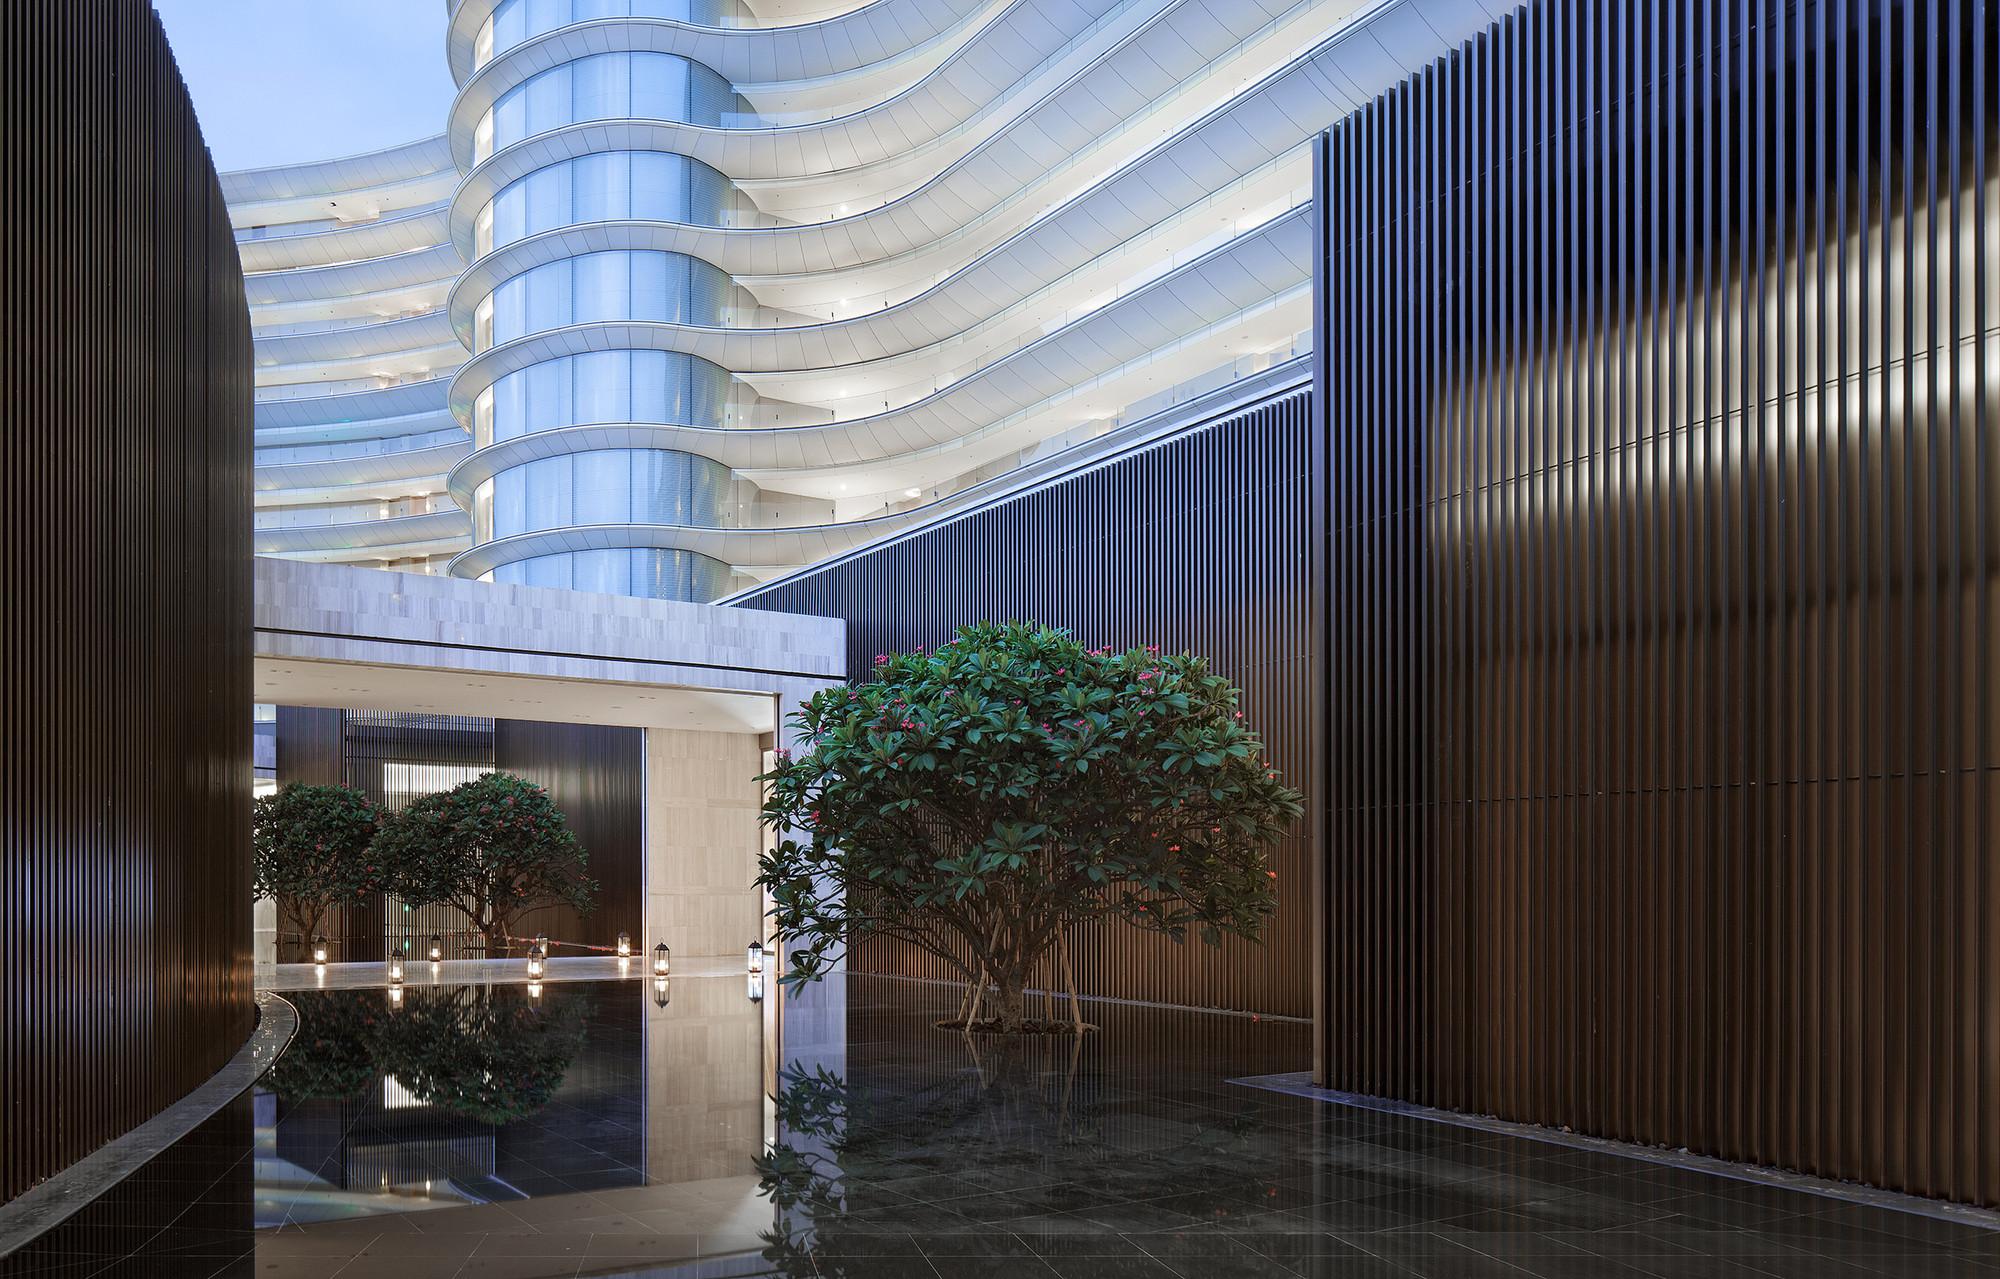 Gallery of hainan blue bay westin resort hotel gad 8 for Resort hotel design